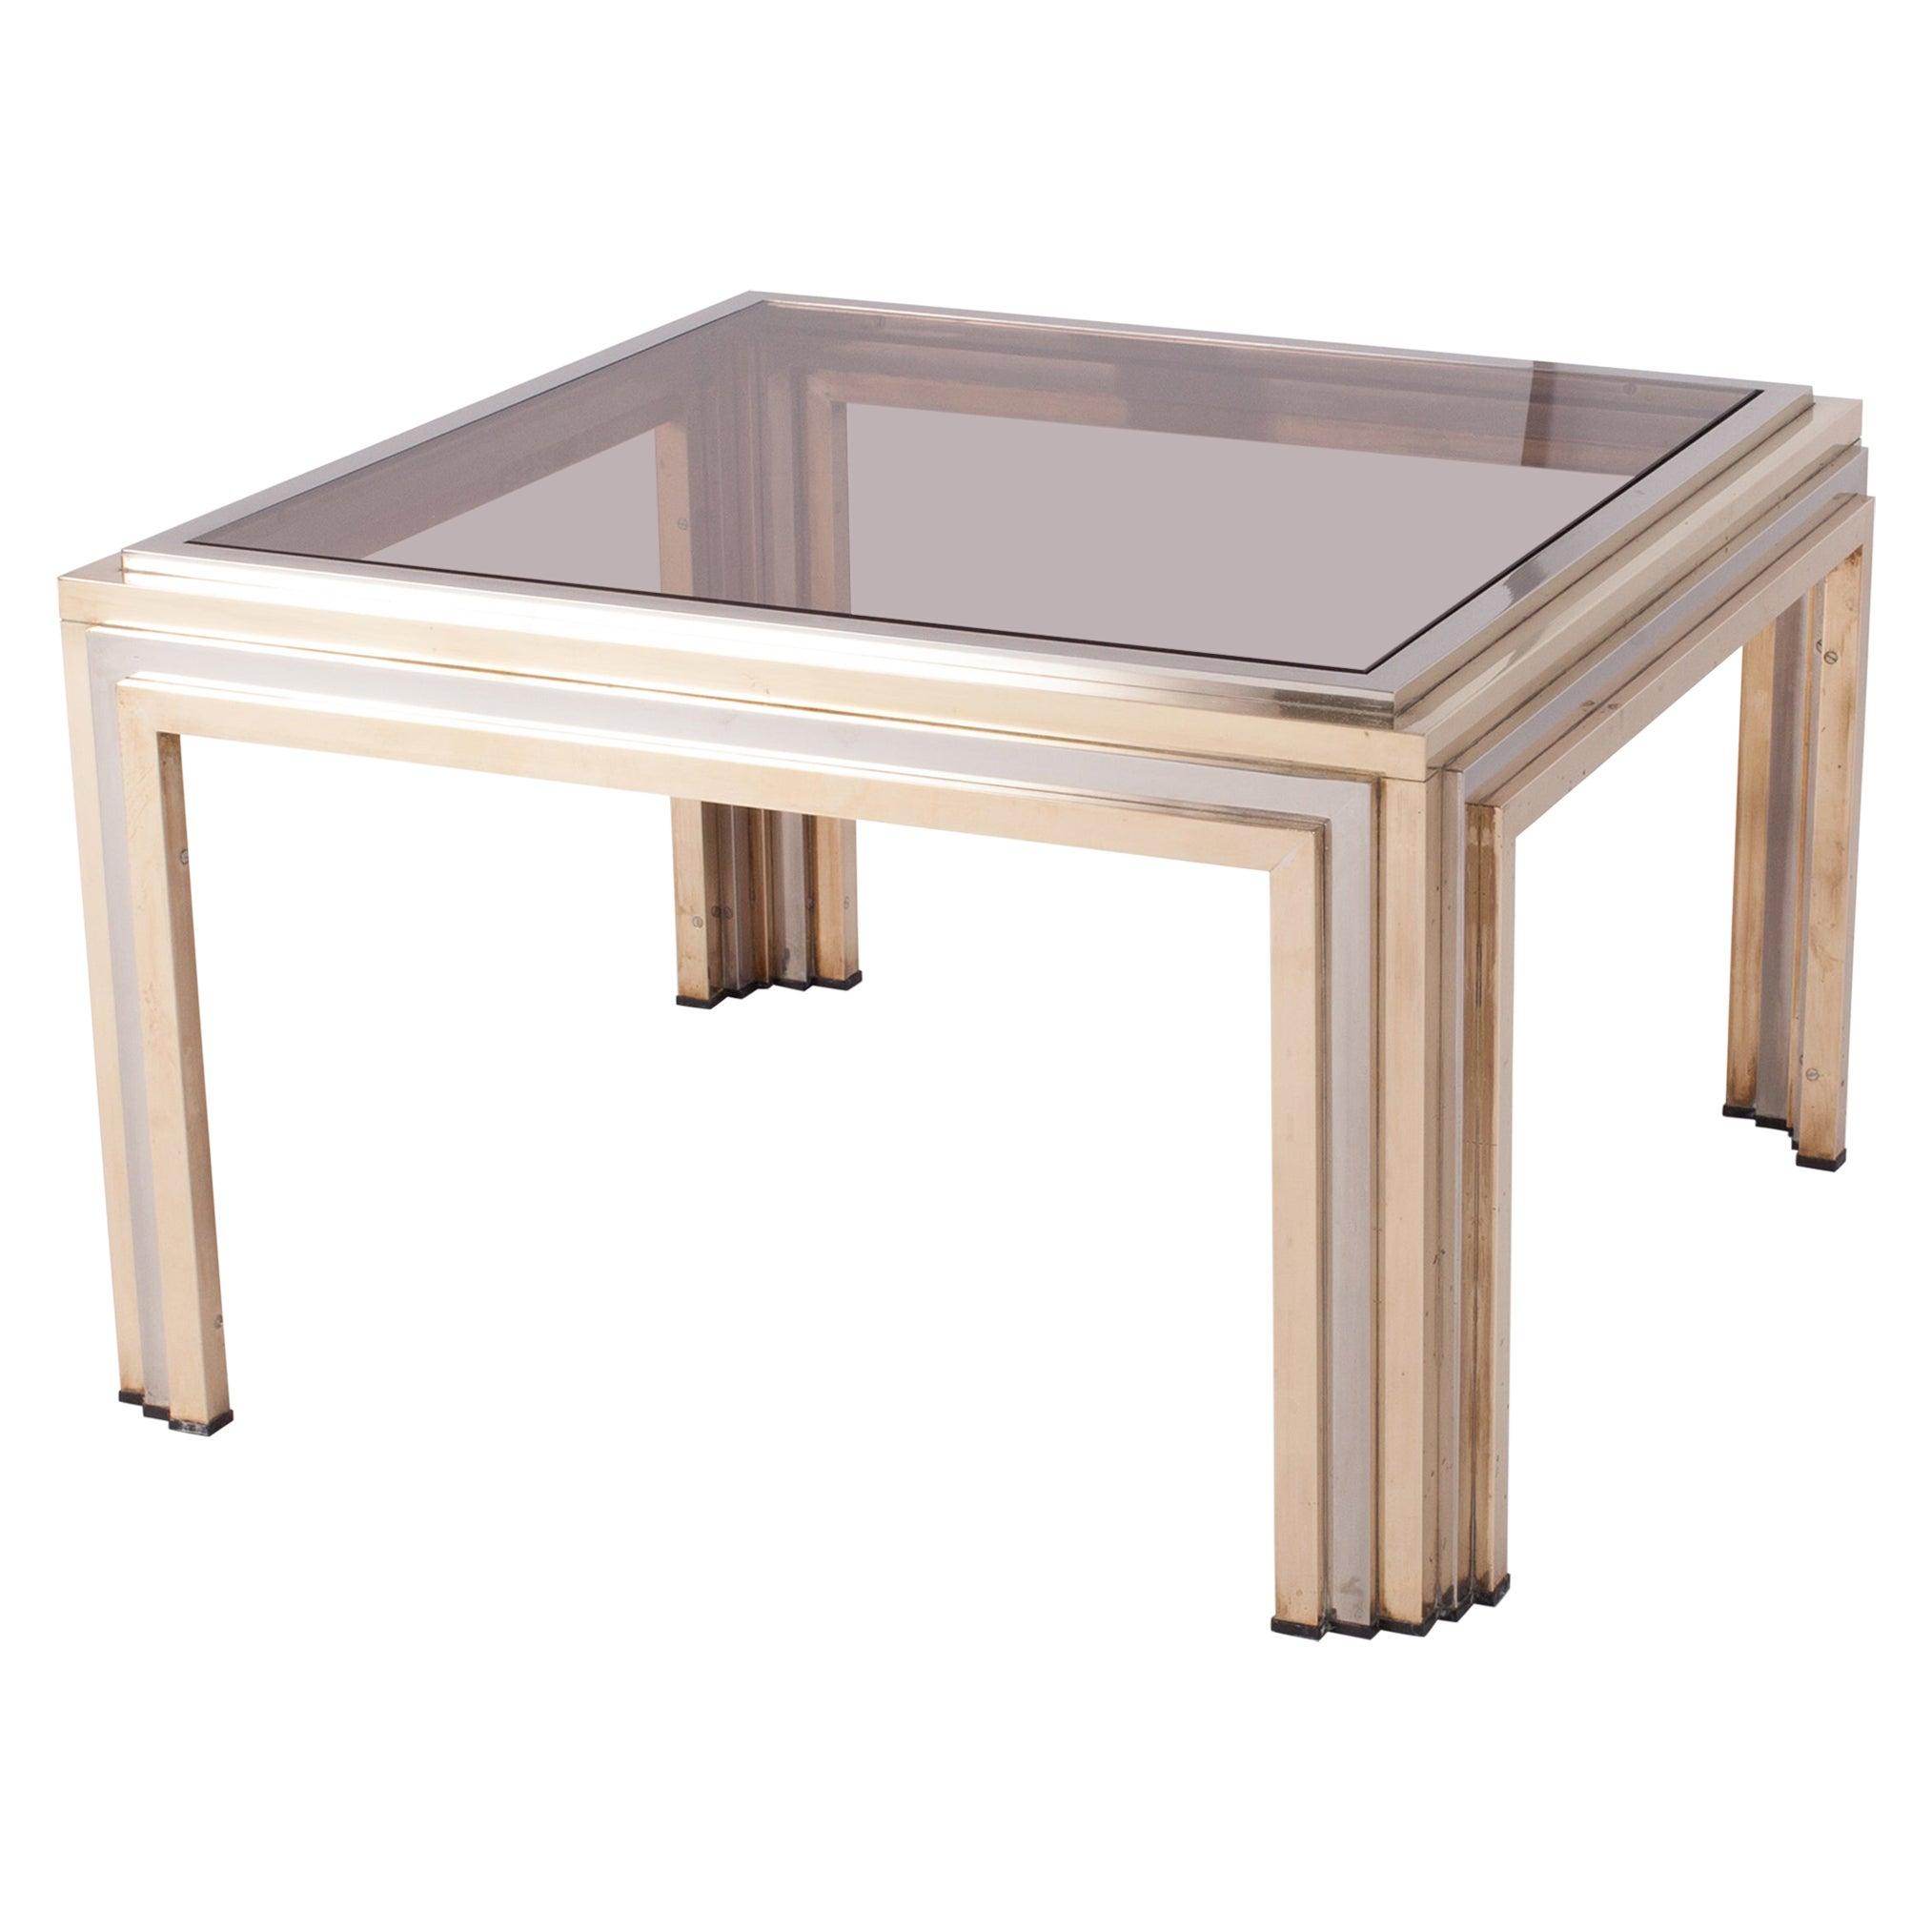 Romeo Rega Brass and Chrome Coffee Table